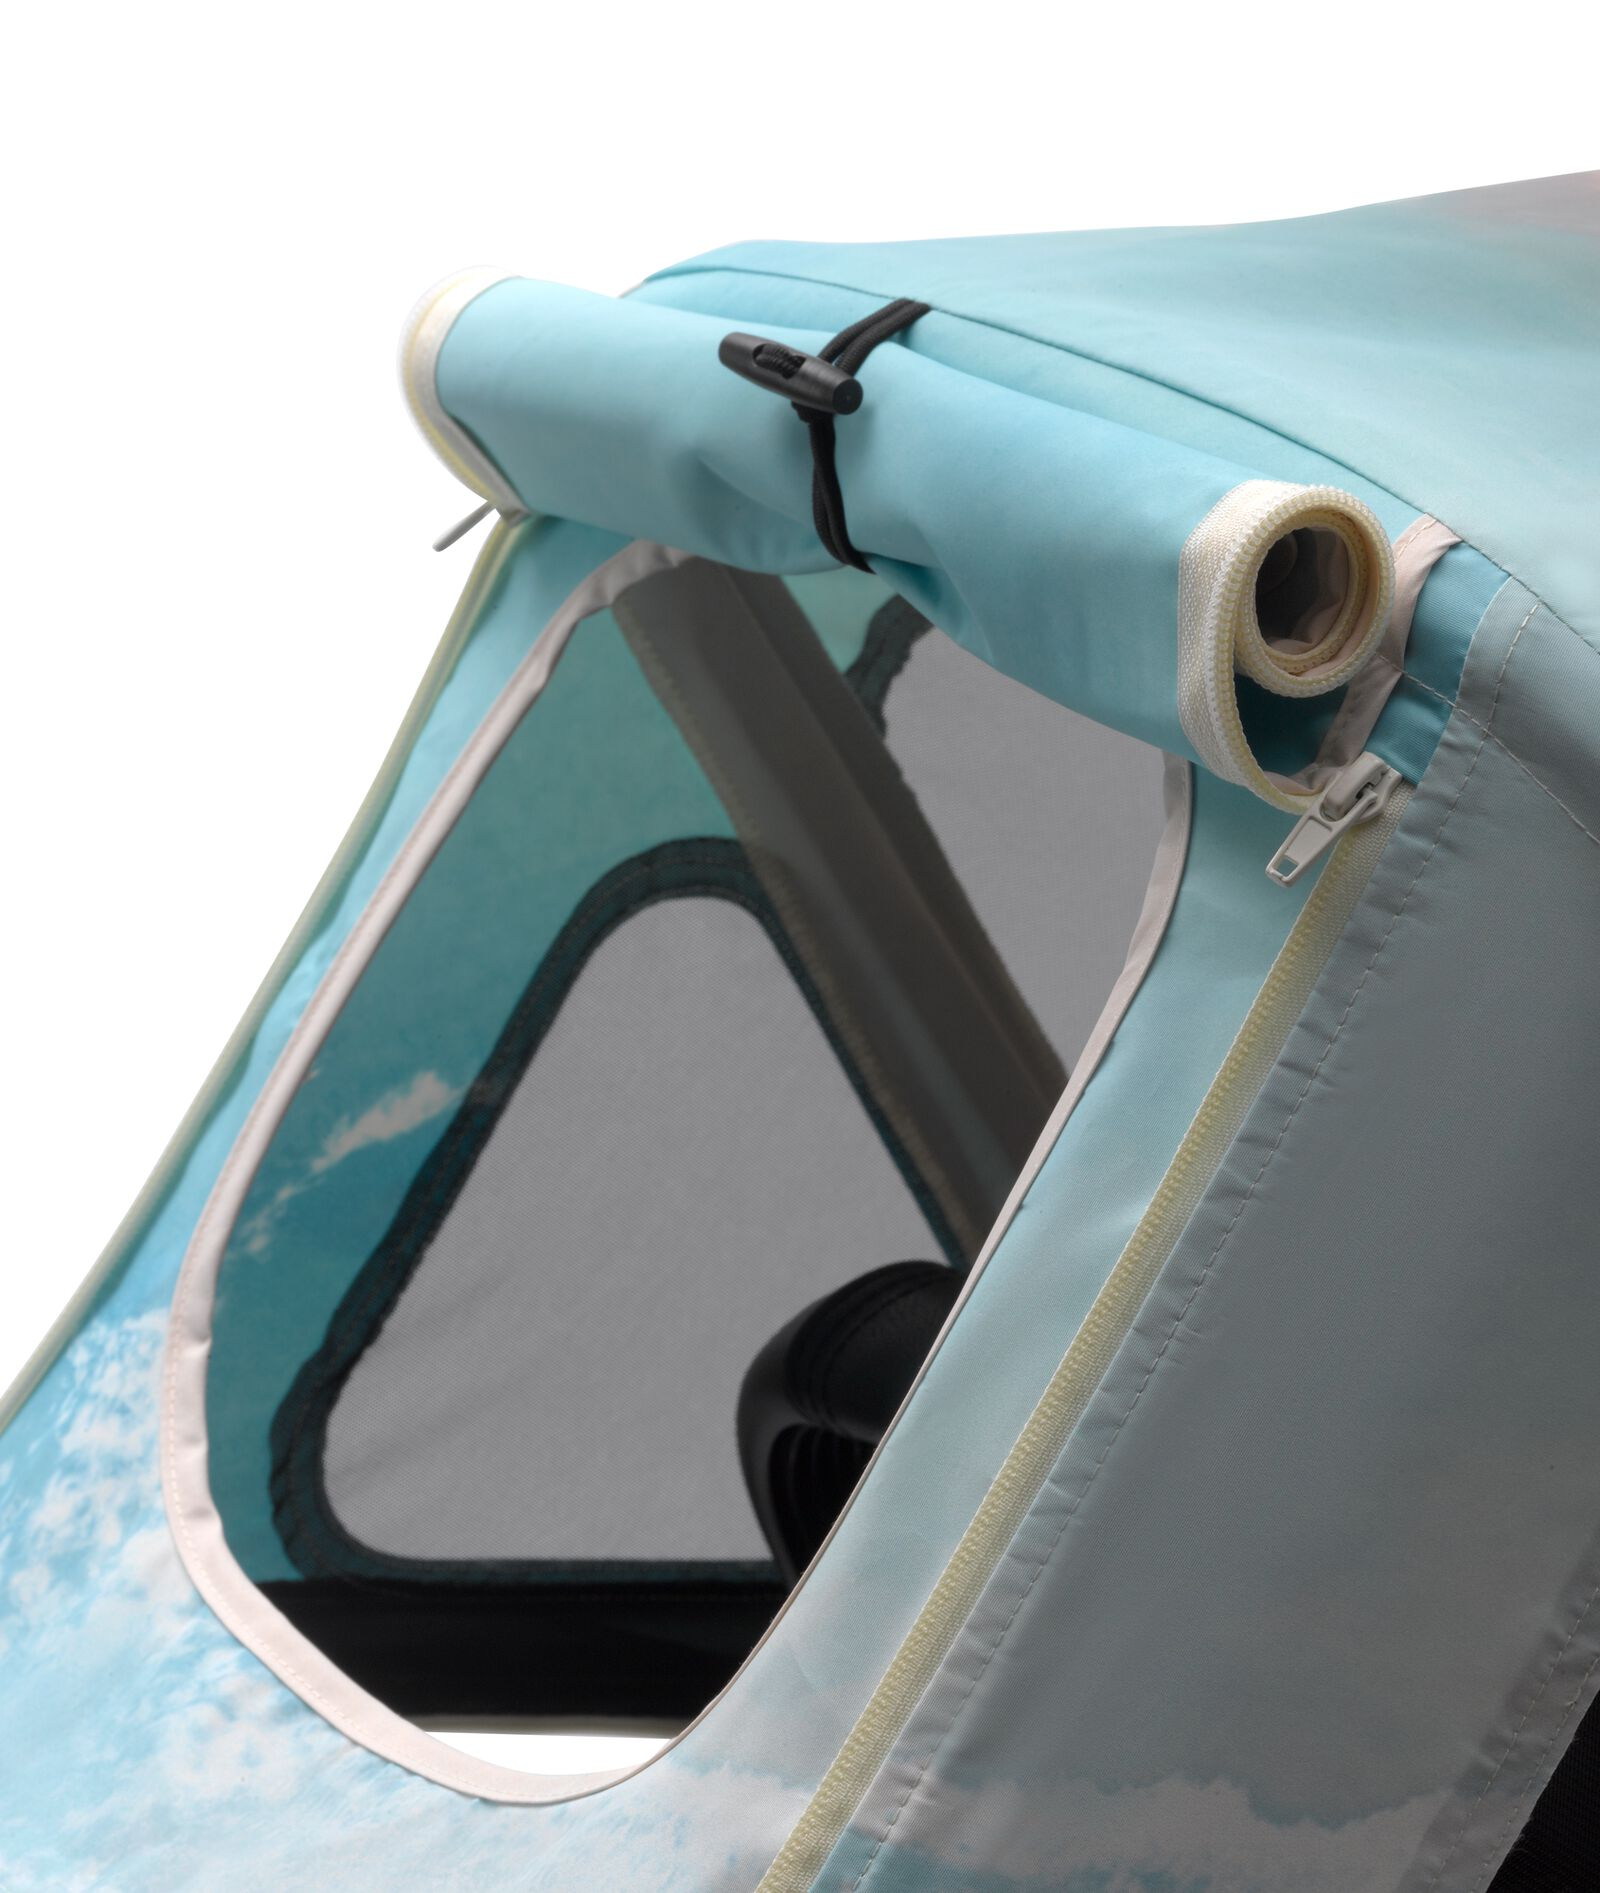 Bugaboo Fox/Cameleon 3 breezy sun canopy